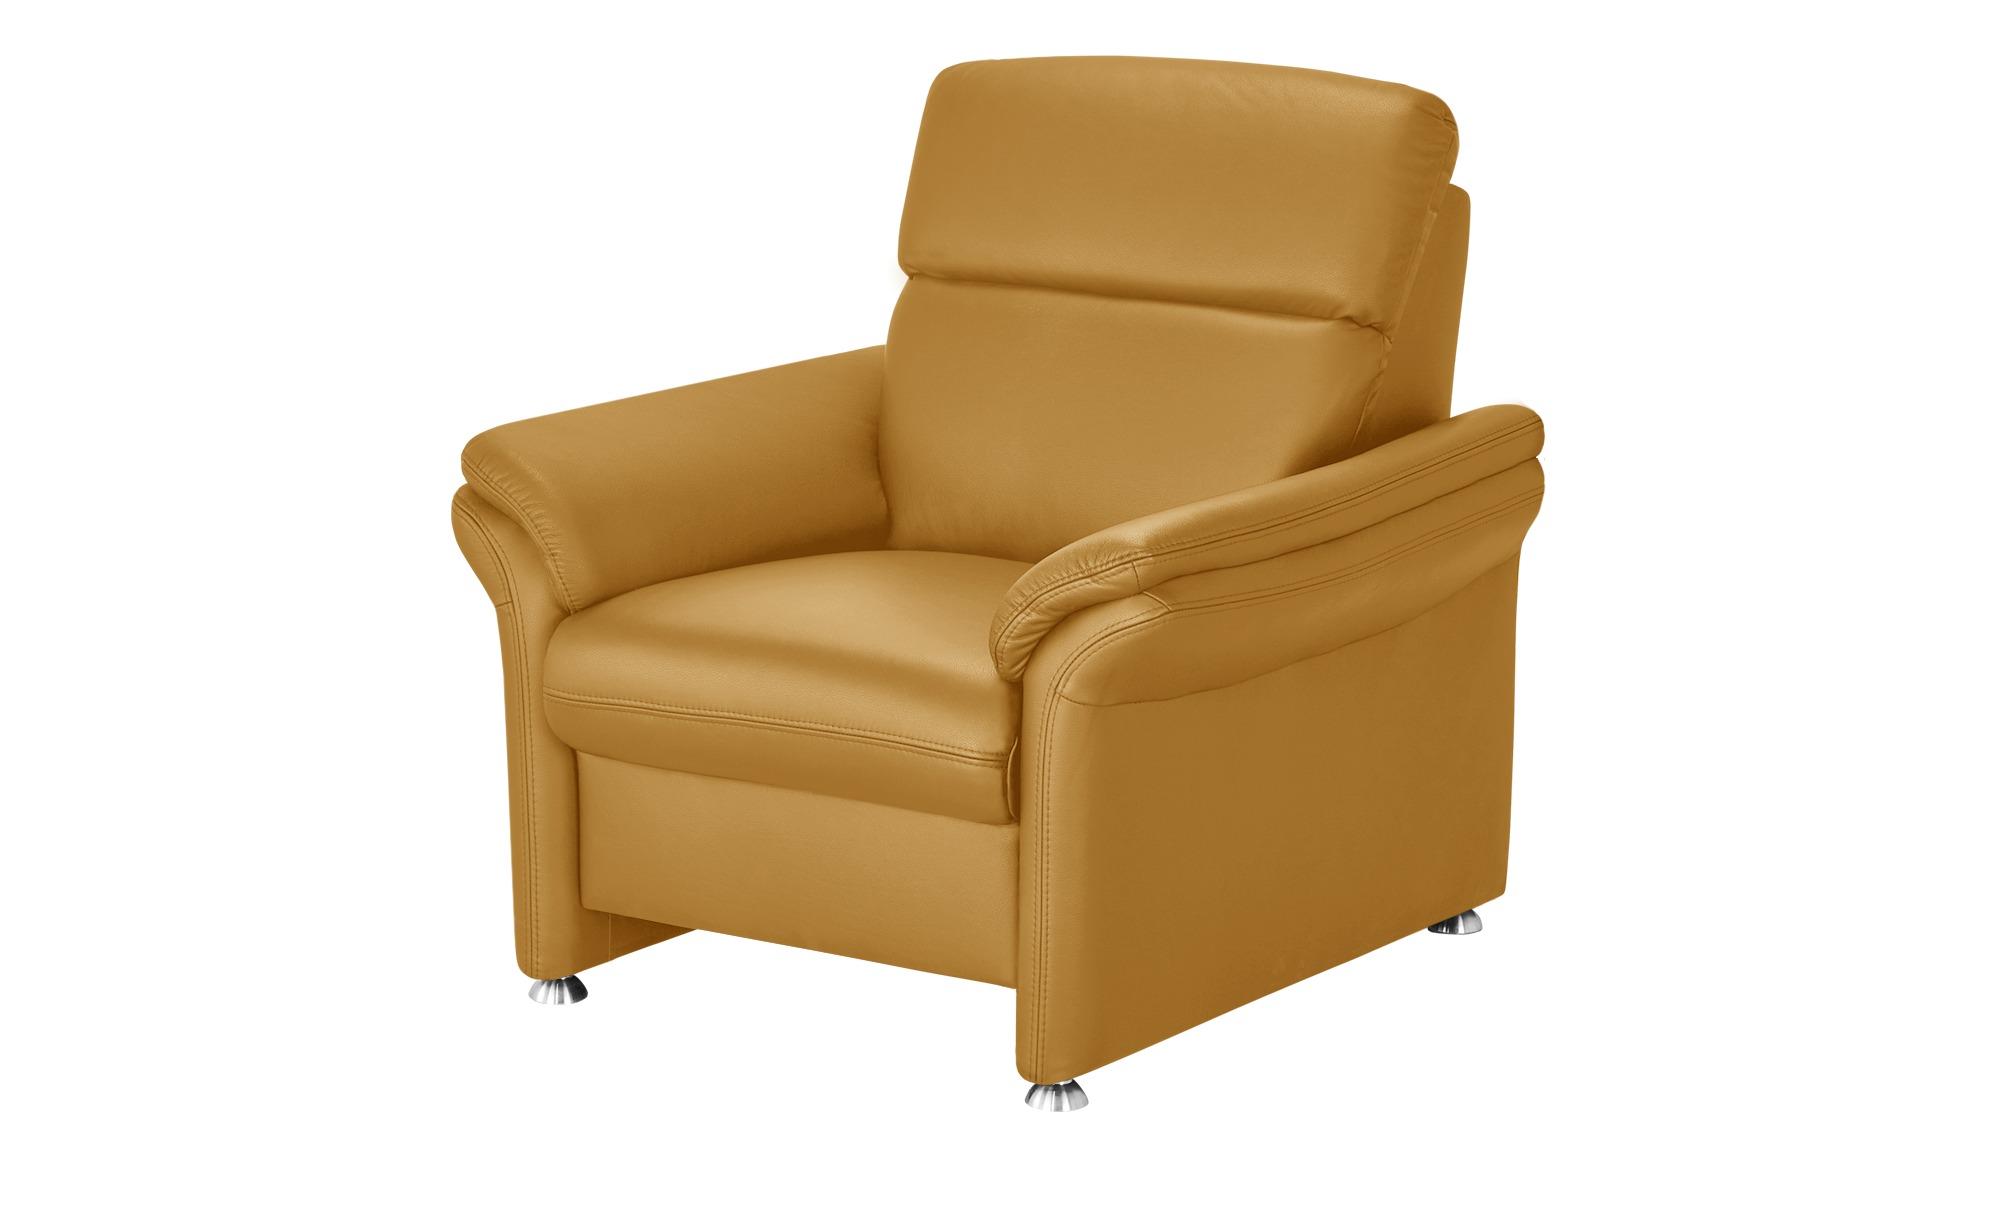 meinSofa Ledersessel gelb - Leder Manon ¦ gelb ¦ Maße (cm): B: 98 H: 94 T: 92 Polstermöbel > Sessel > Ledersessel - Höffner